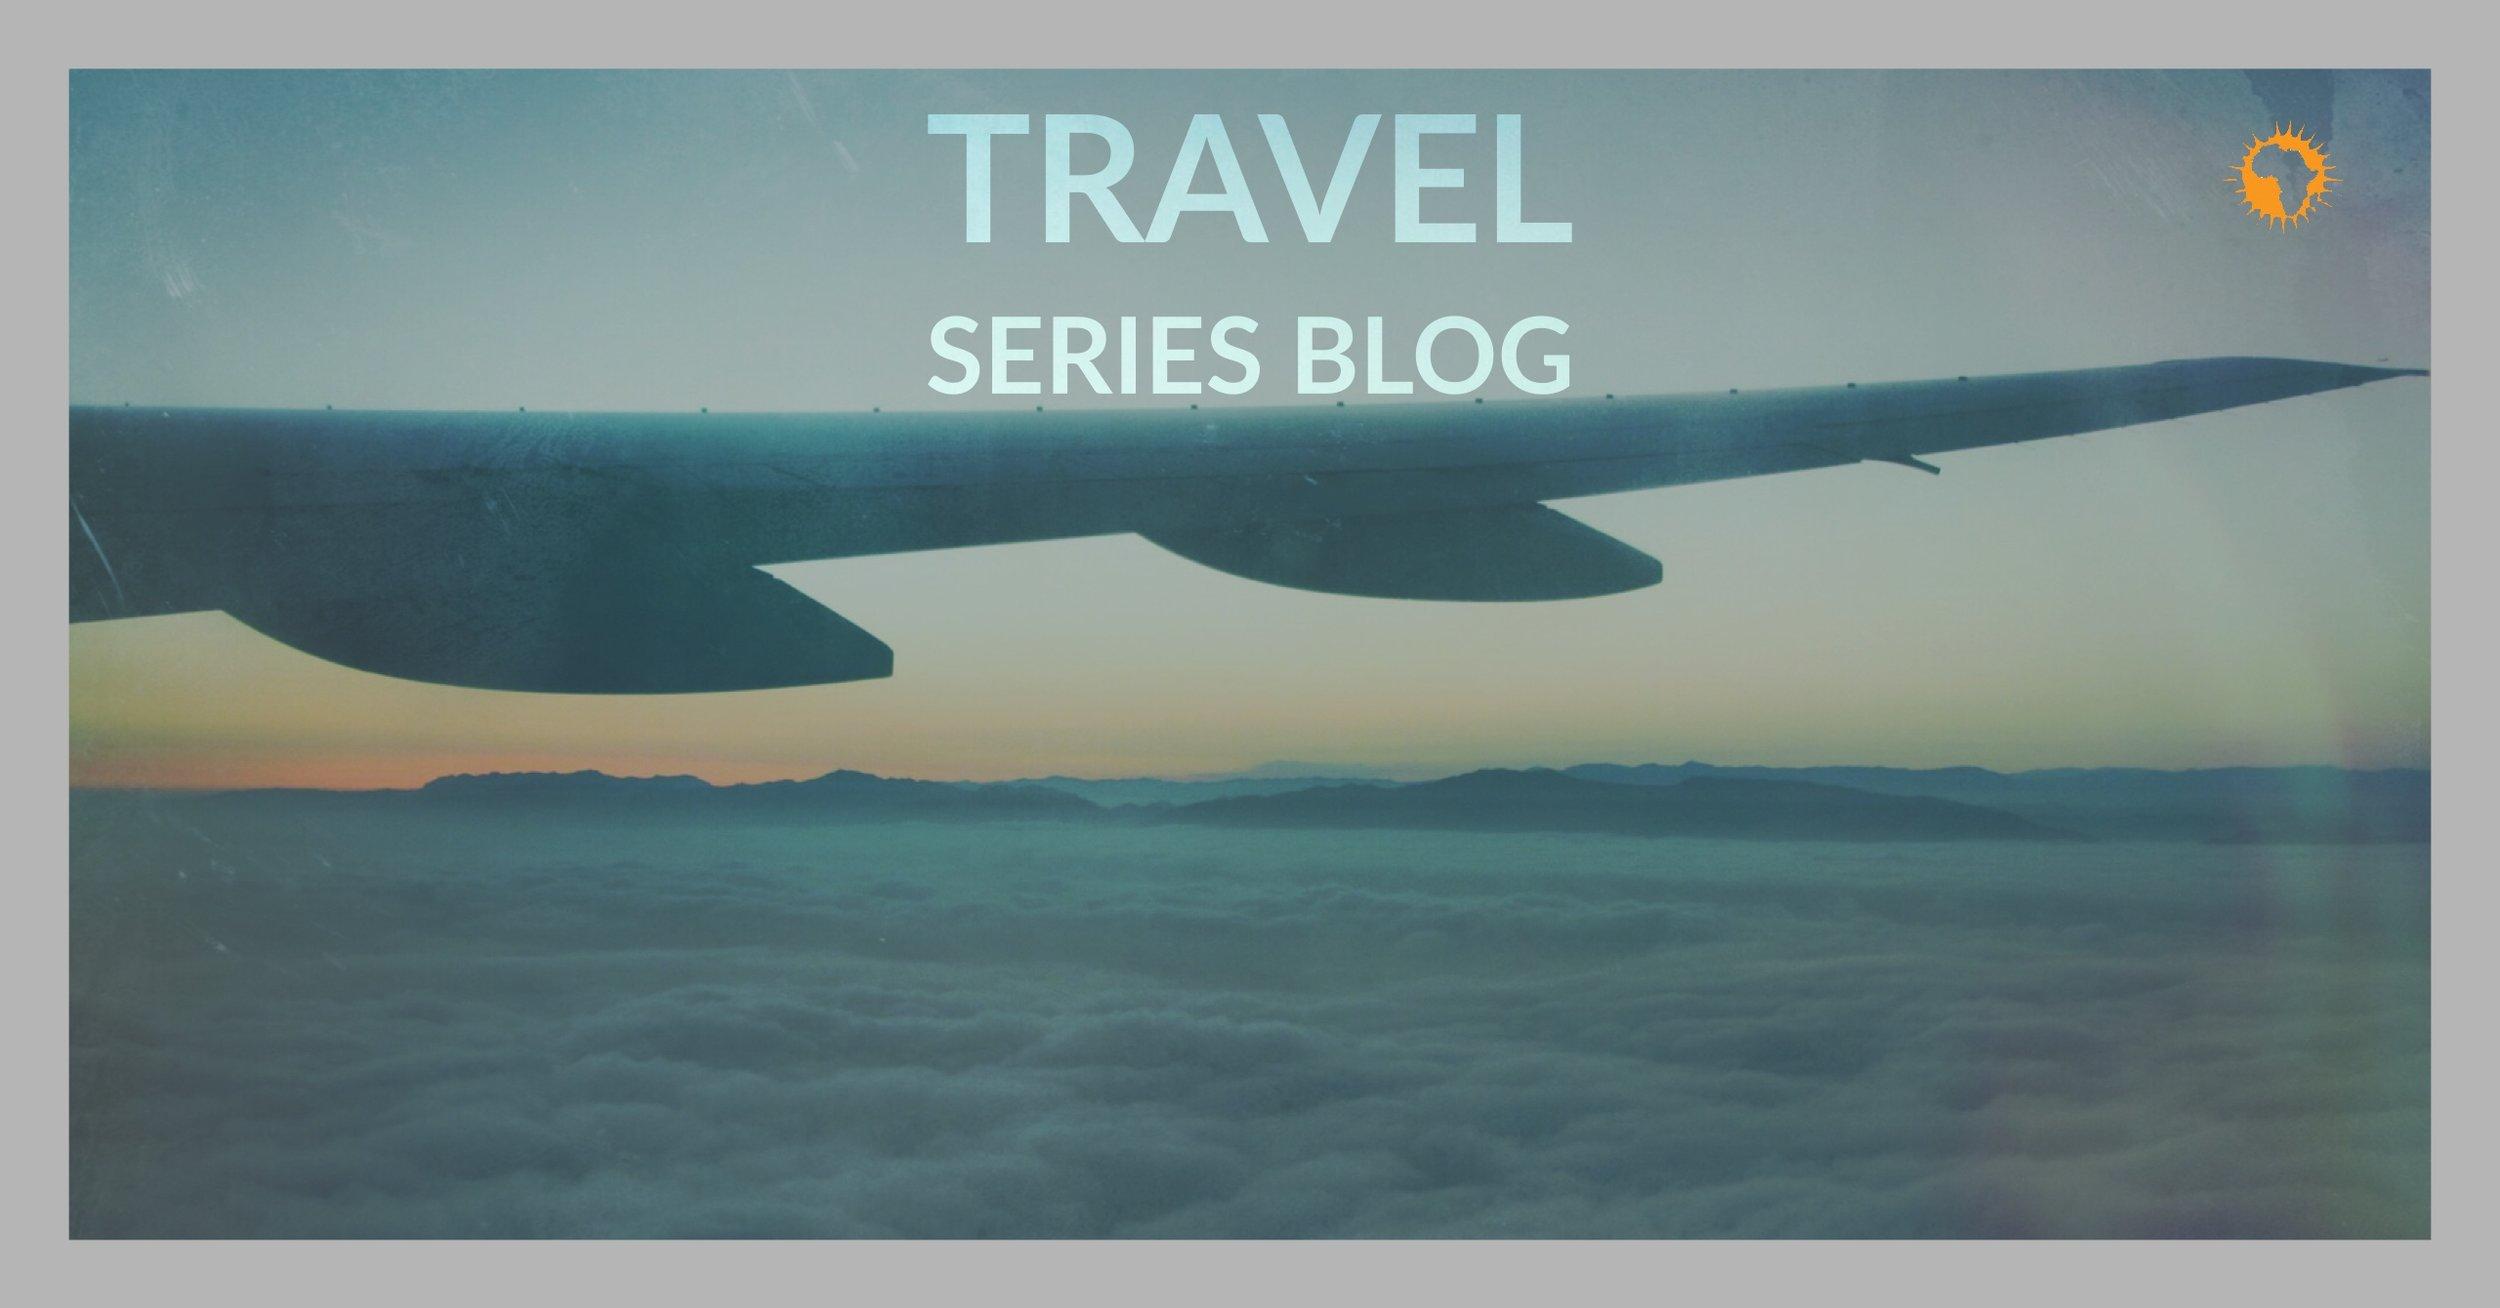 travelseriesblog